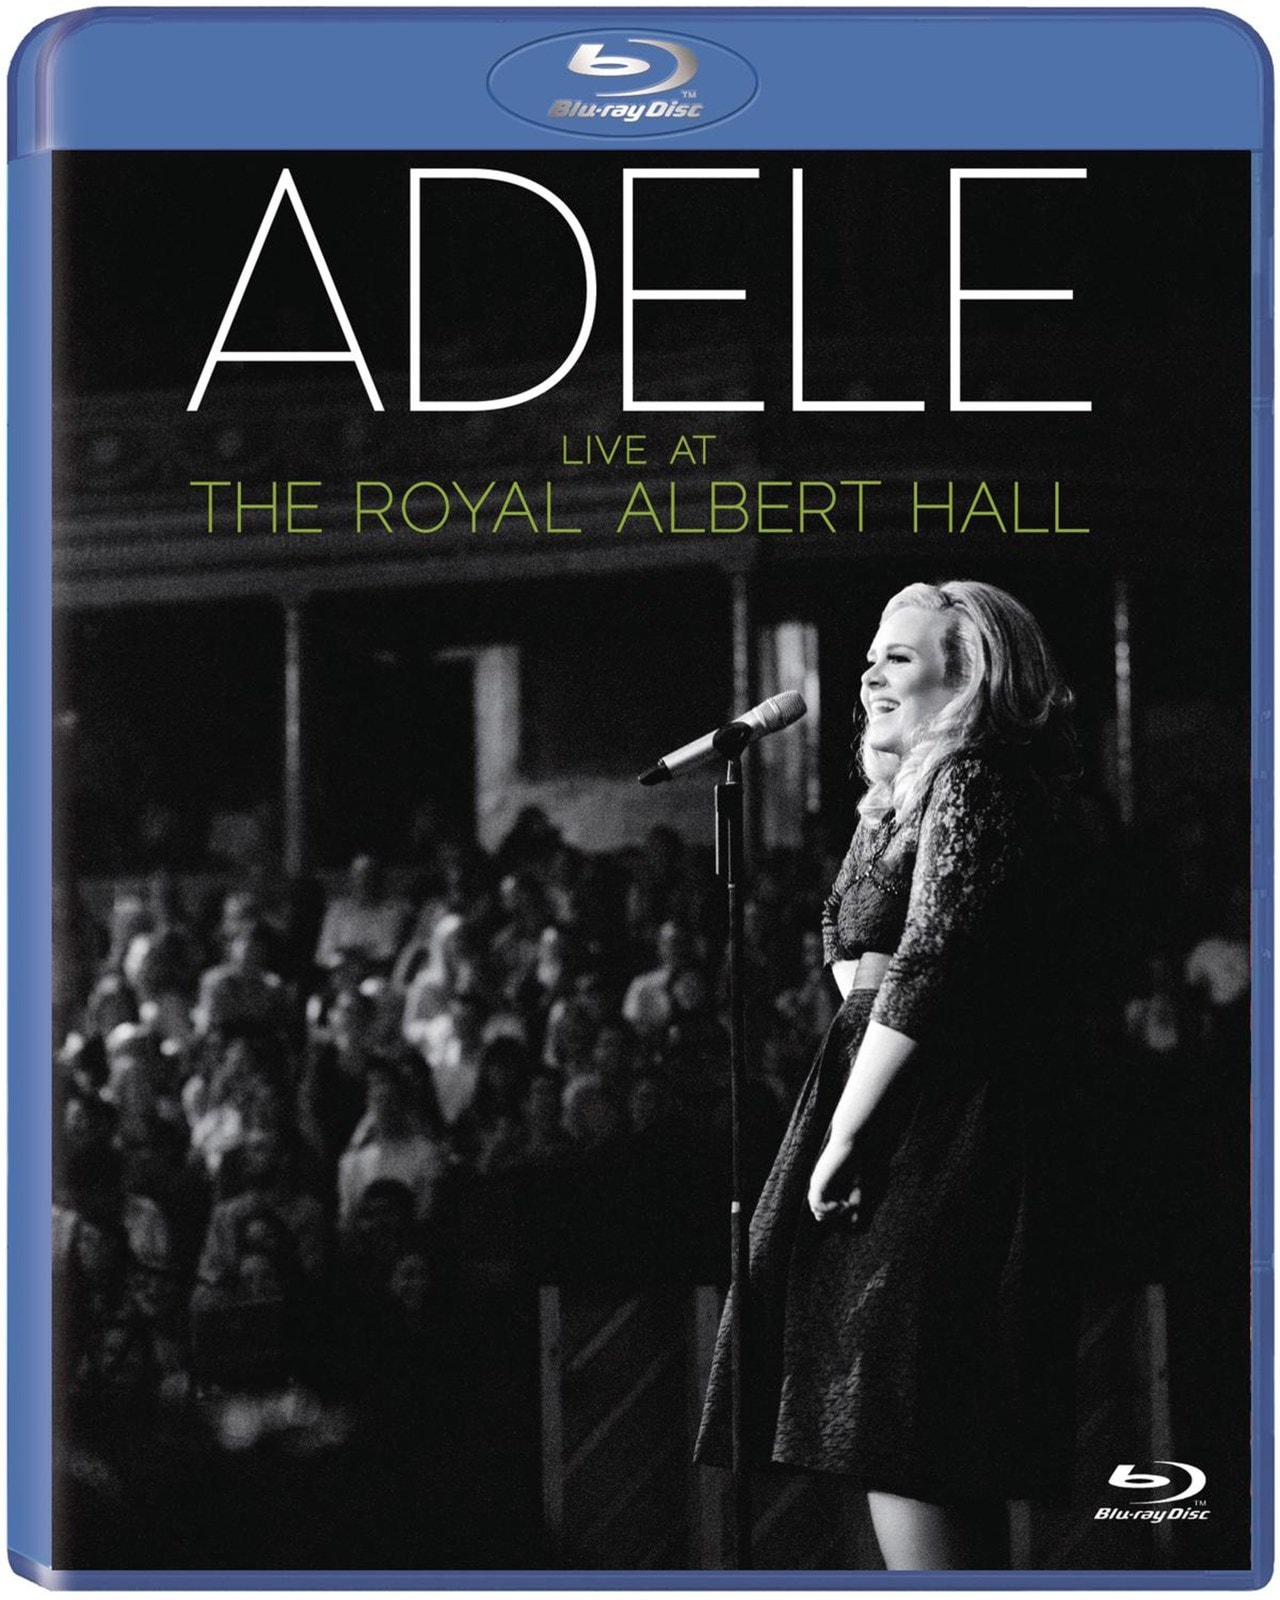 Adele: Live at the Royal Albert Hall - 1